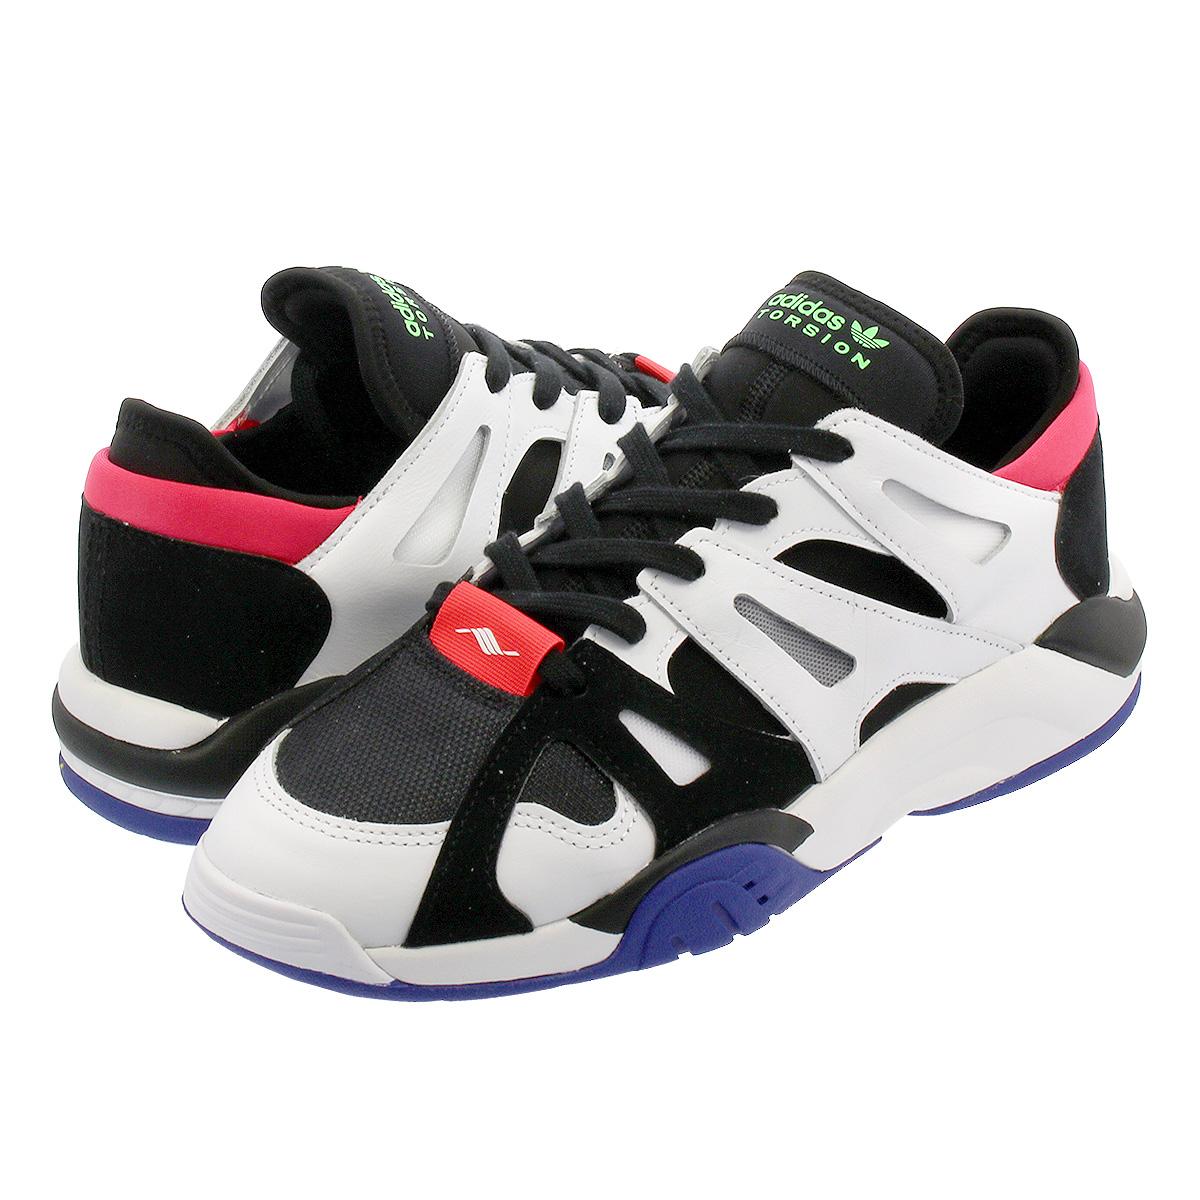 adidas DIMENSION LO Adidas dimension low CORE BLACKRUNNNIG WHITEACTIVE BLUE bd7648